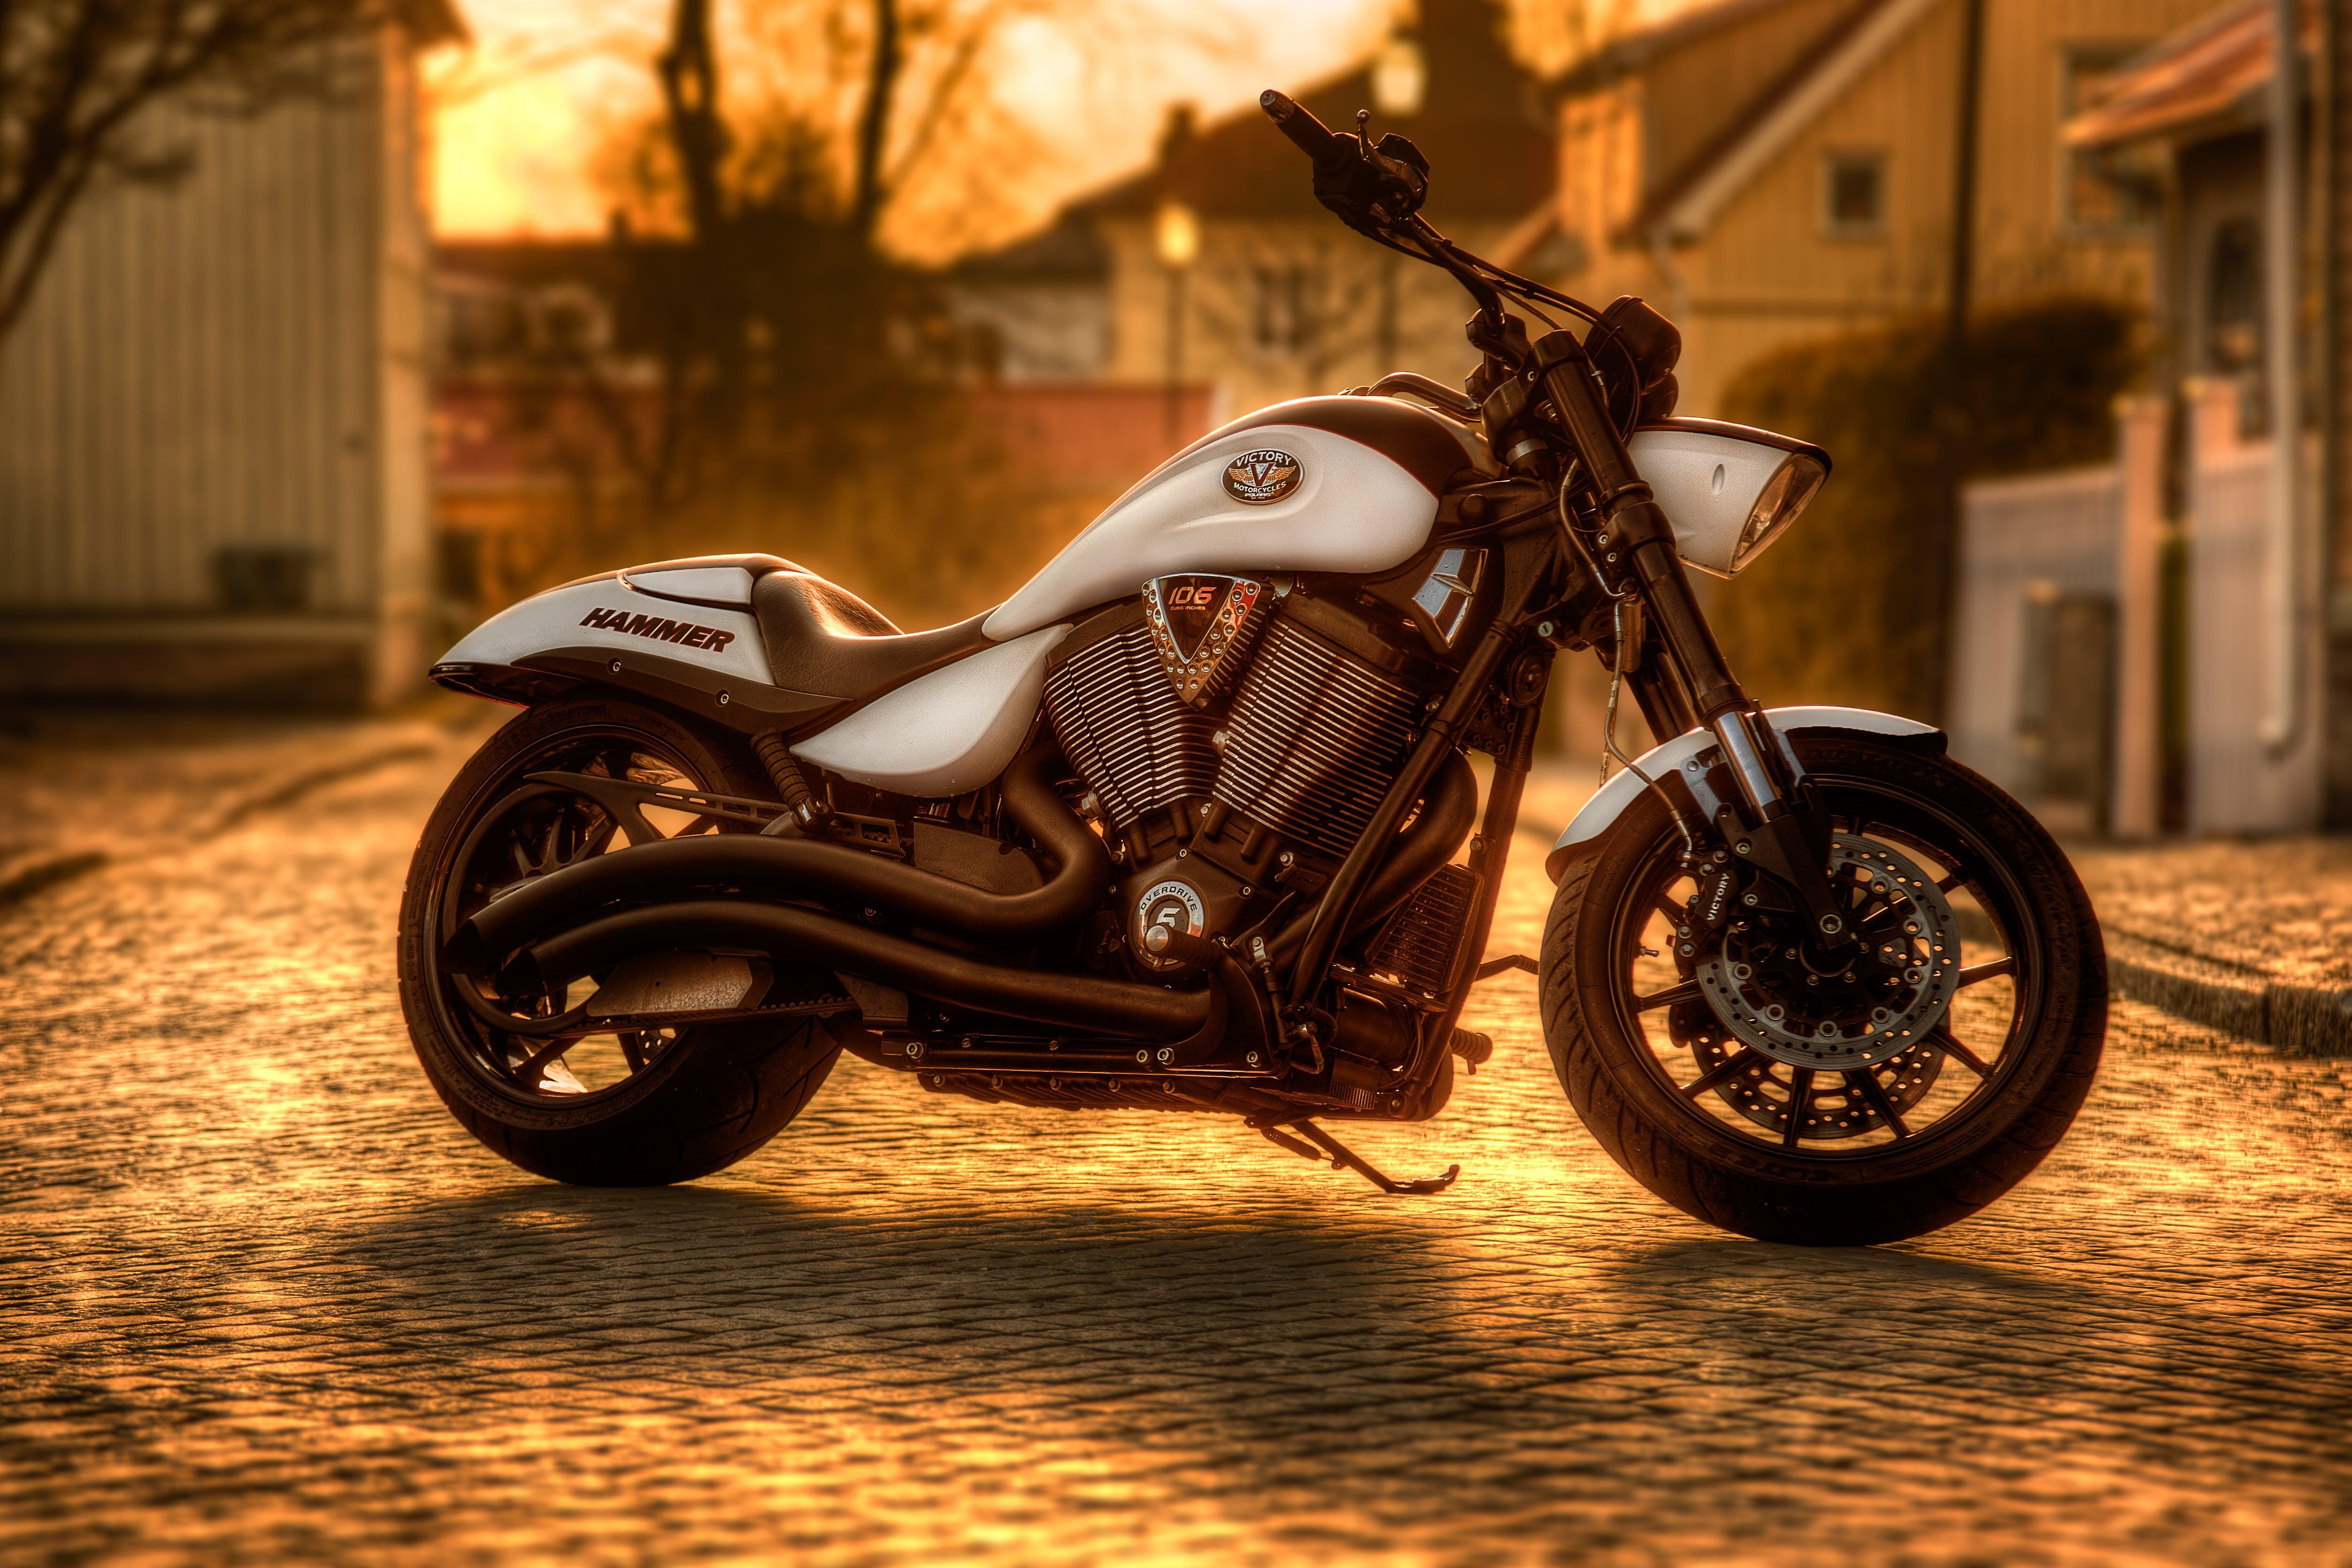 motorbike a photo  Motorbike Pictures · Pexels · Free Stock Photos